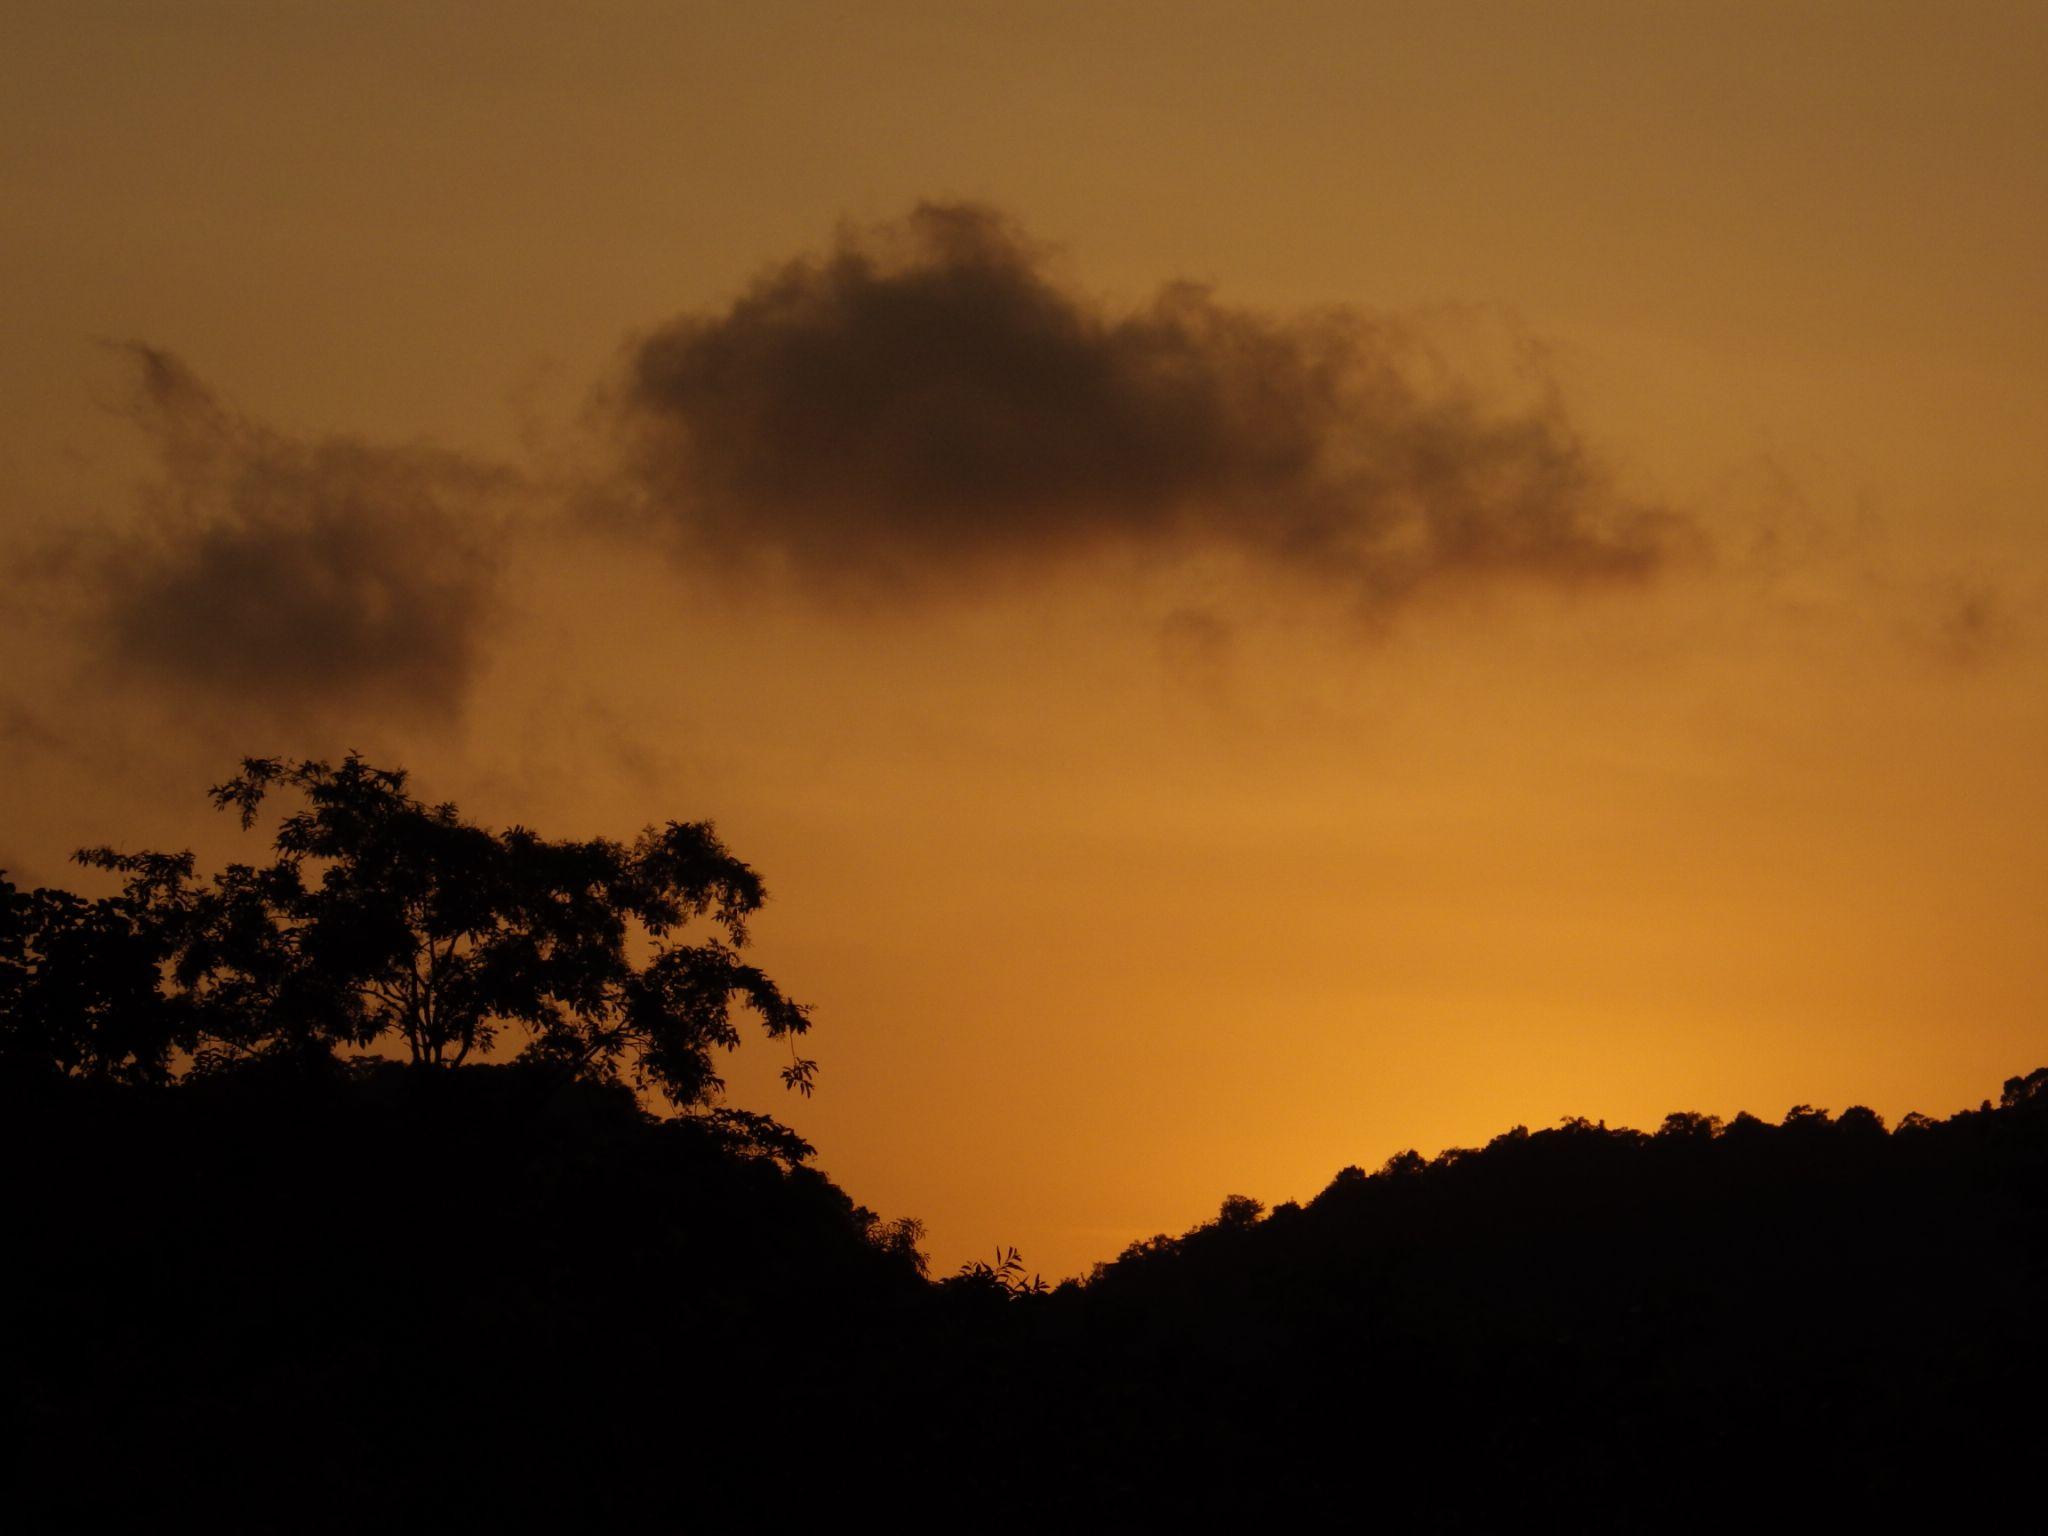 sunset by Suprasad v